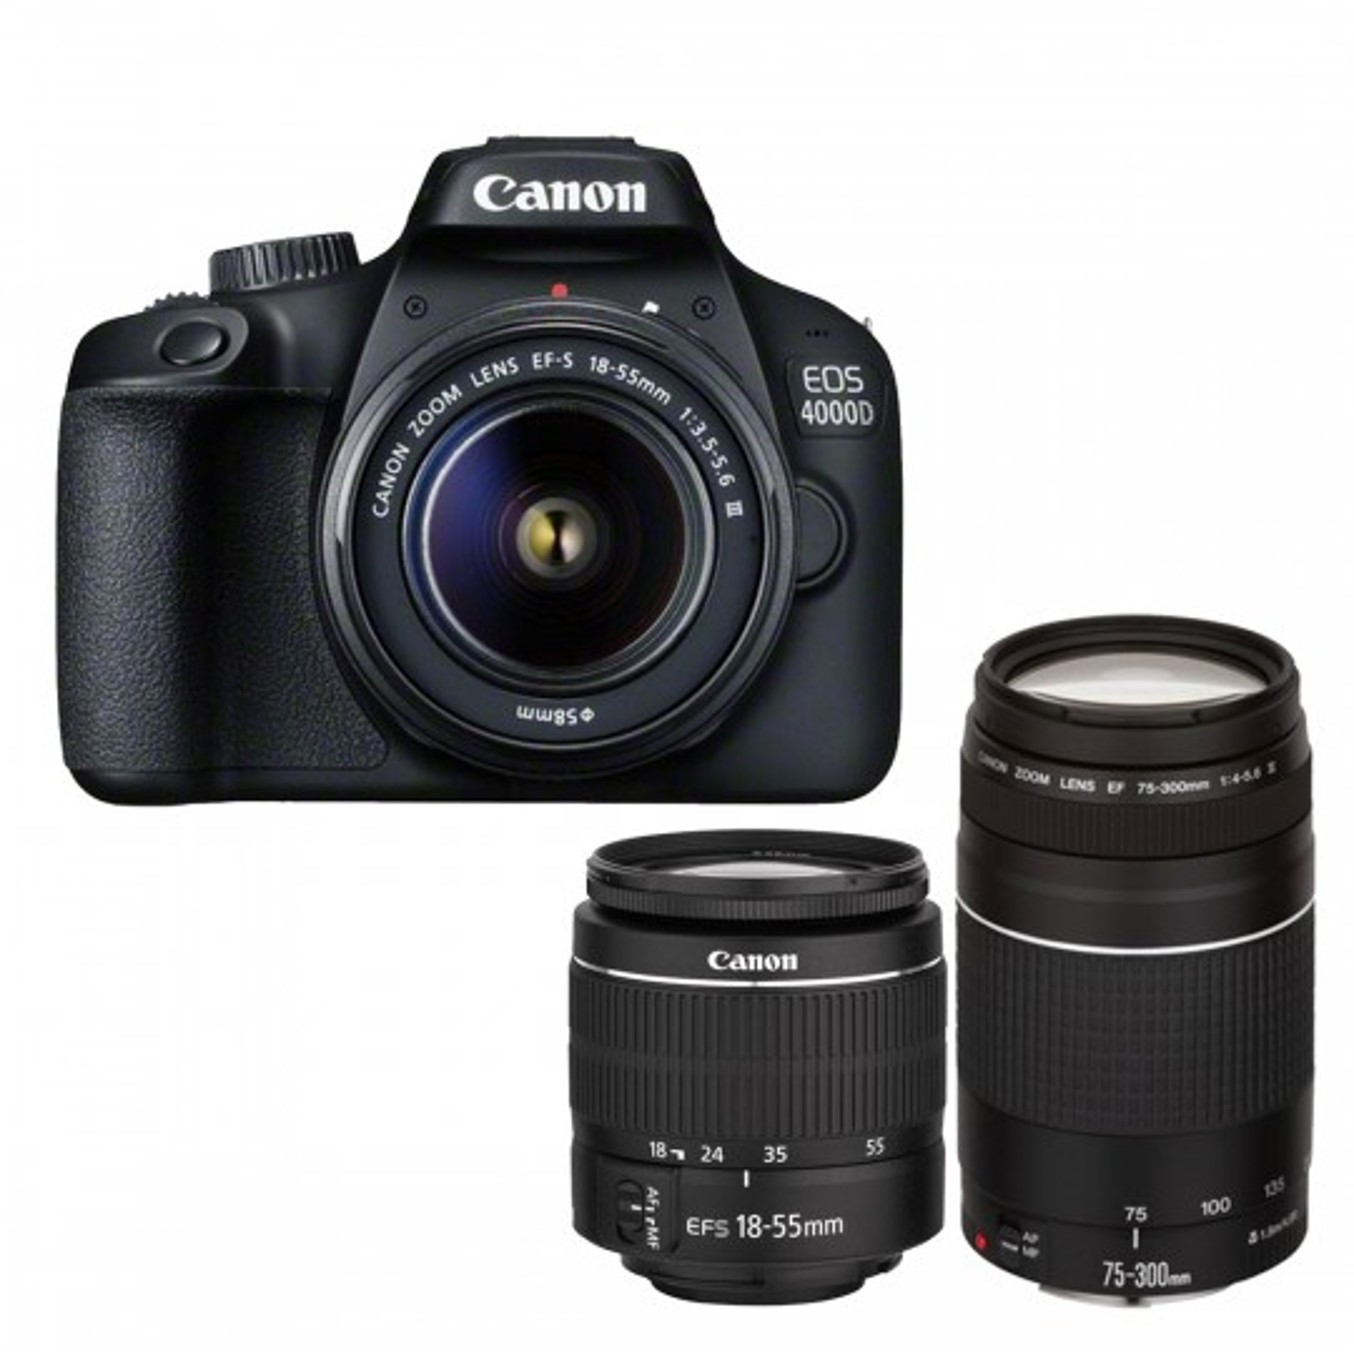 Camara digital reflex canon eos 4000d 18-55 dc + 7